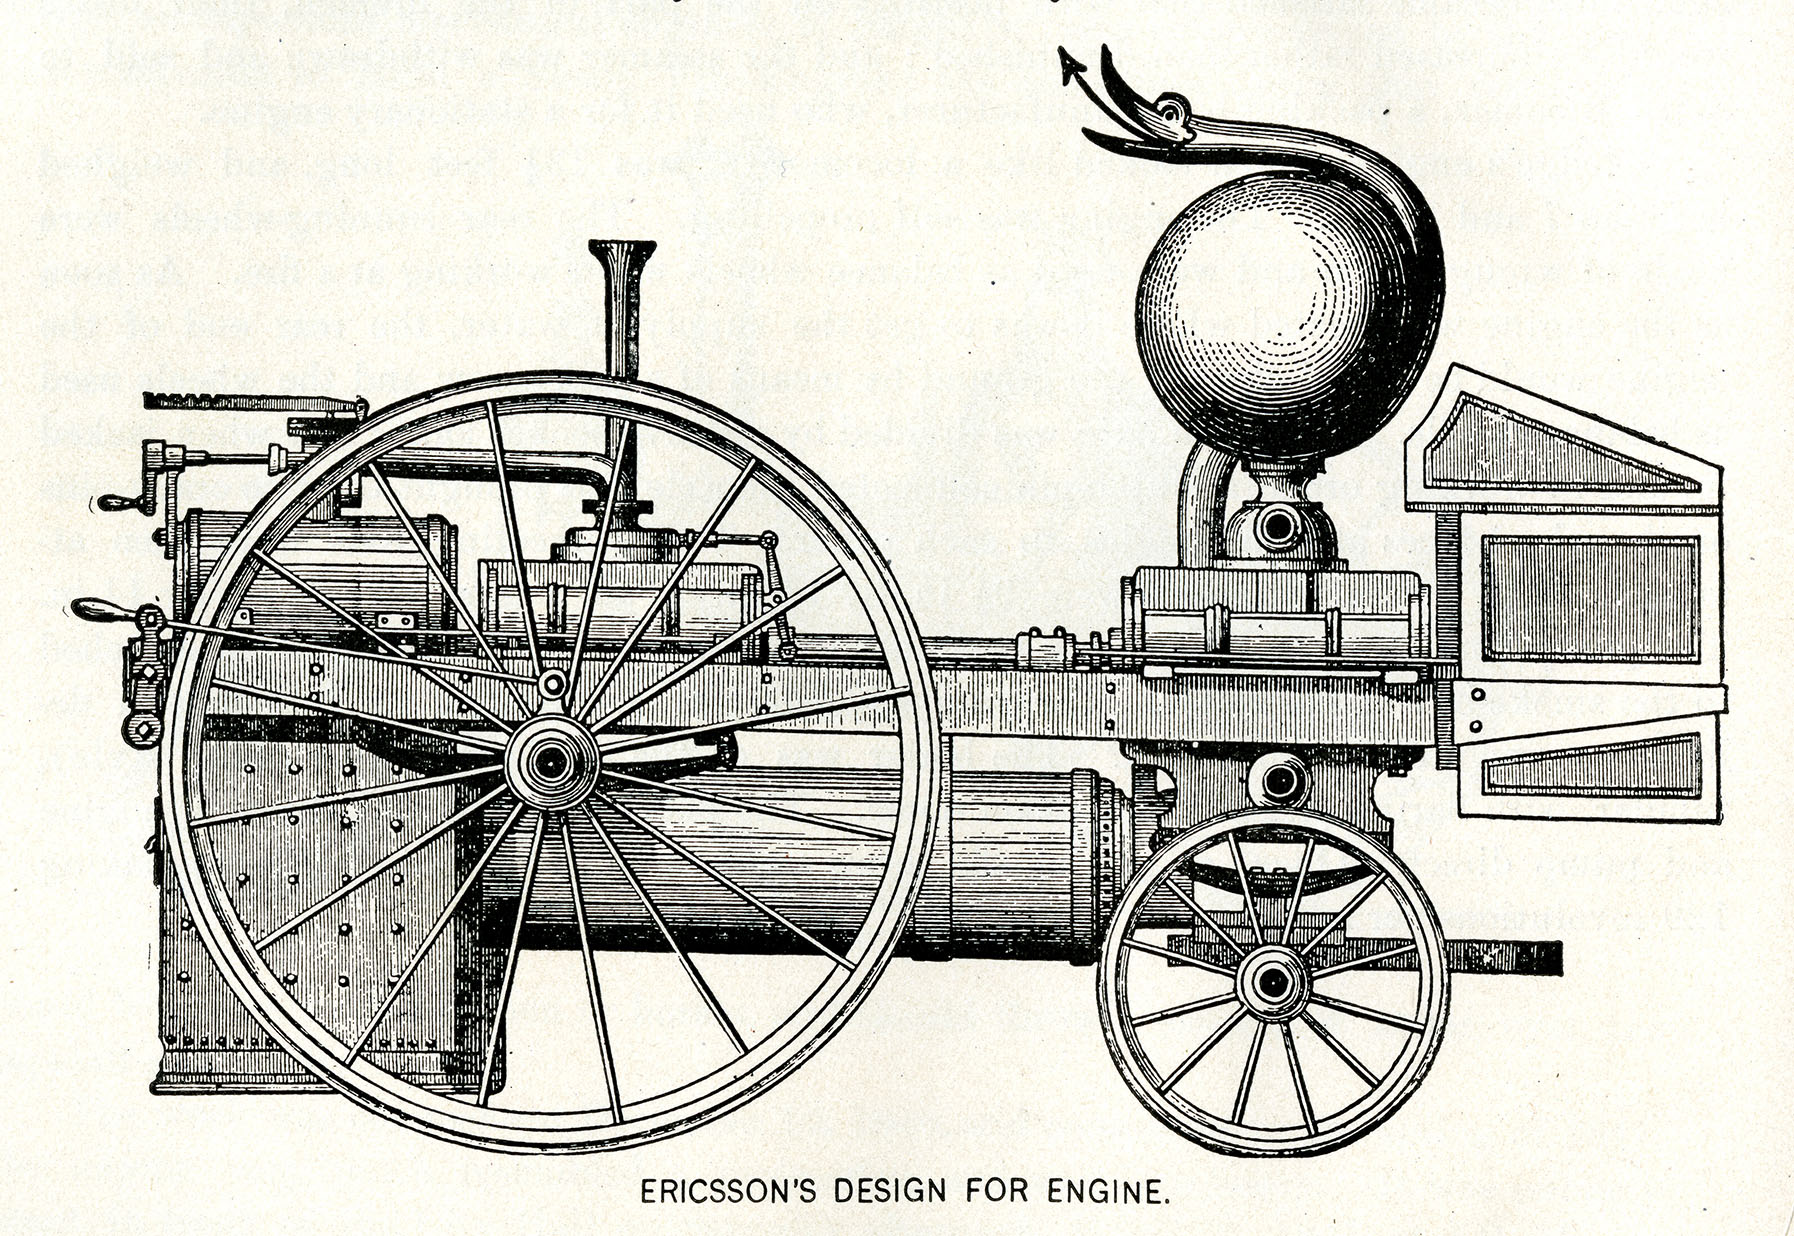 King_FireEngine_Ericsson_1841_b